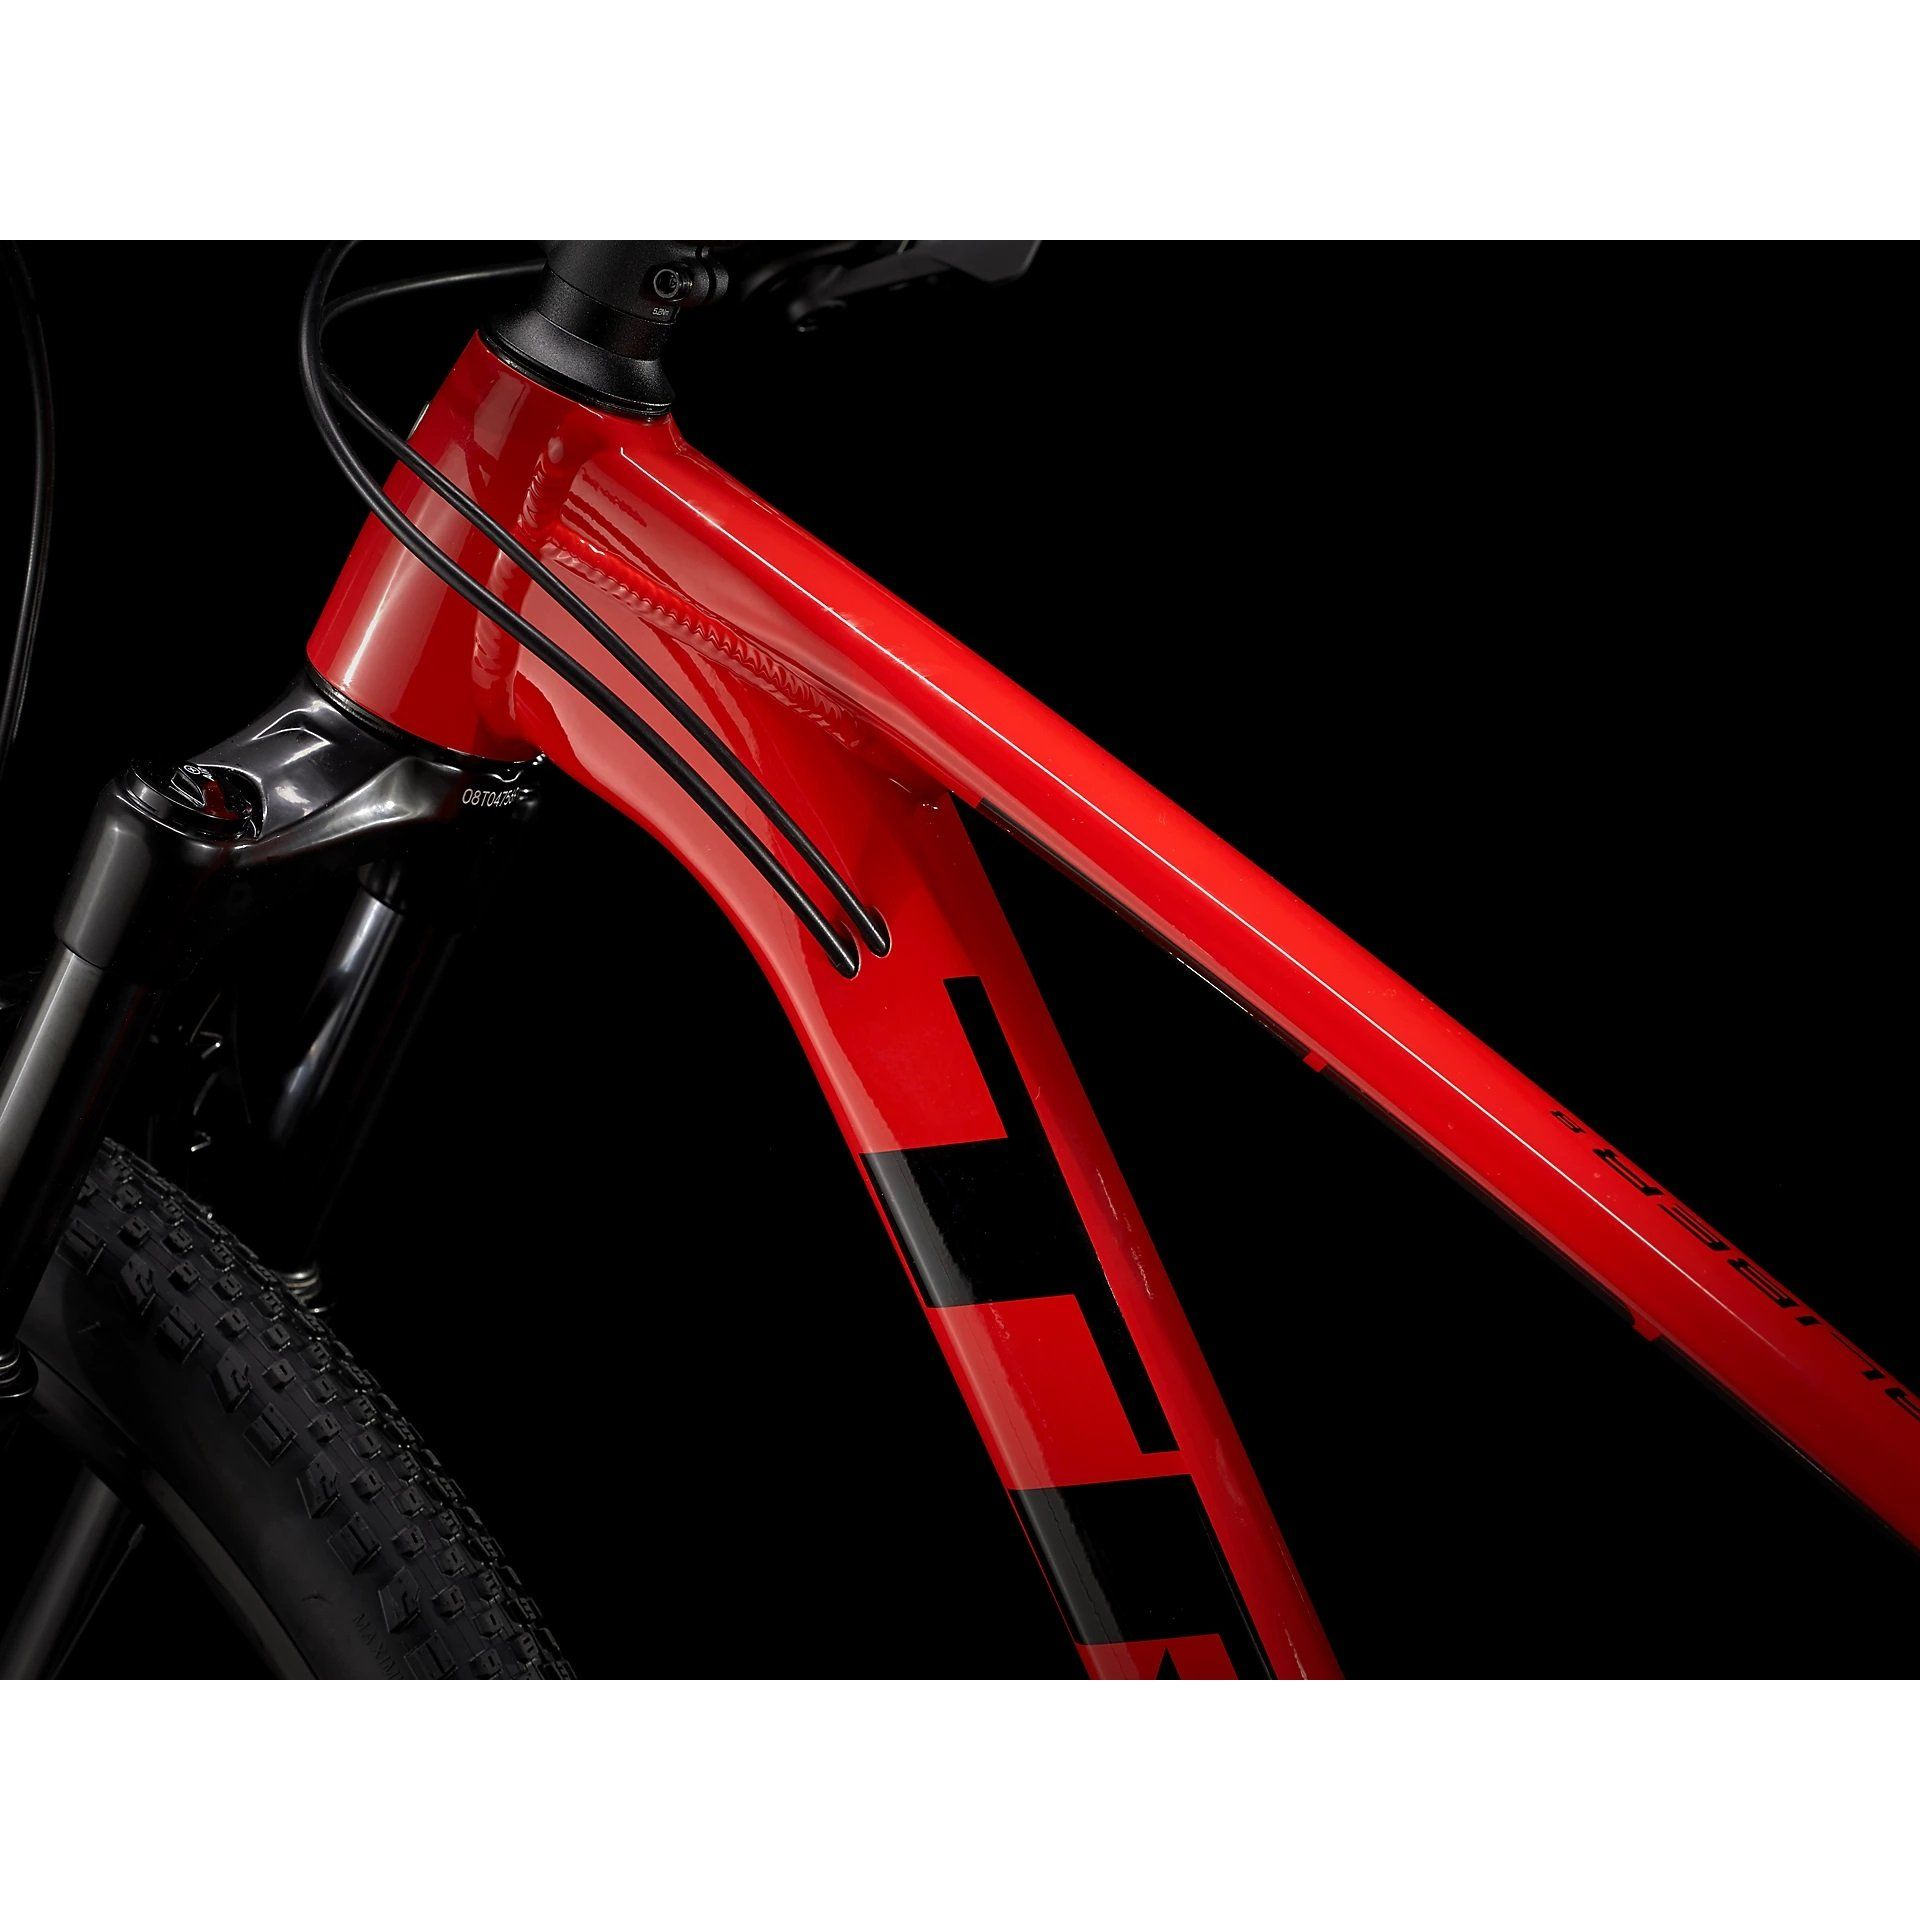 ROWER TREK X-CALIBER 8 RADIOACTIVE RED|TREK BLACK 5